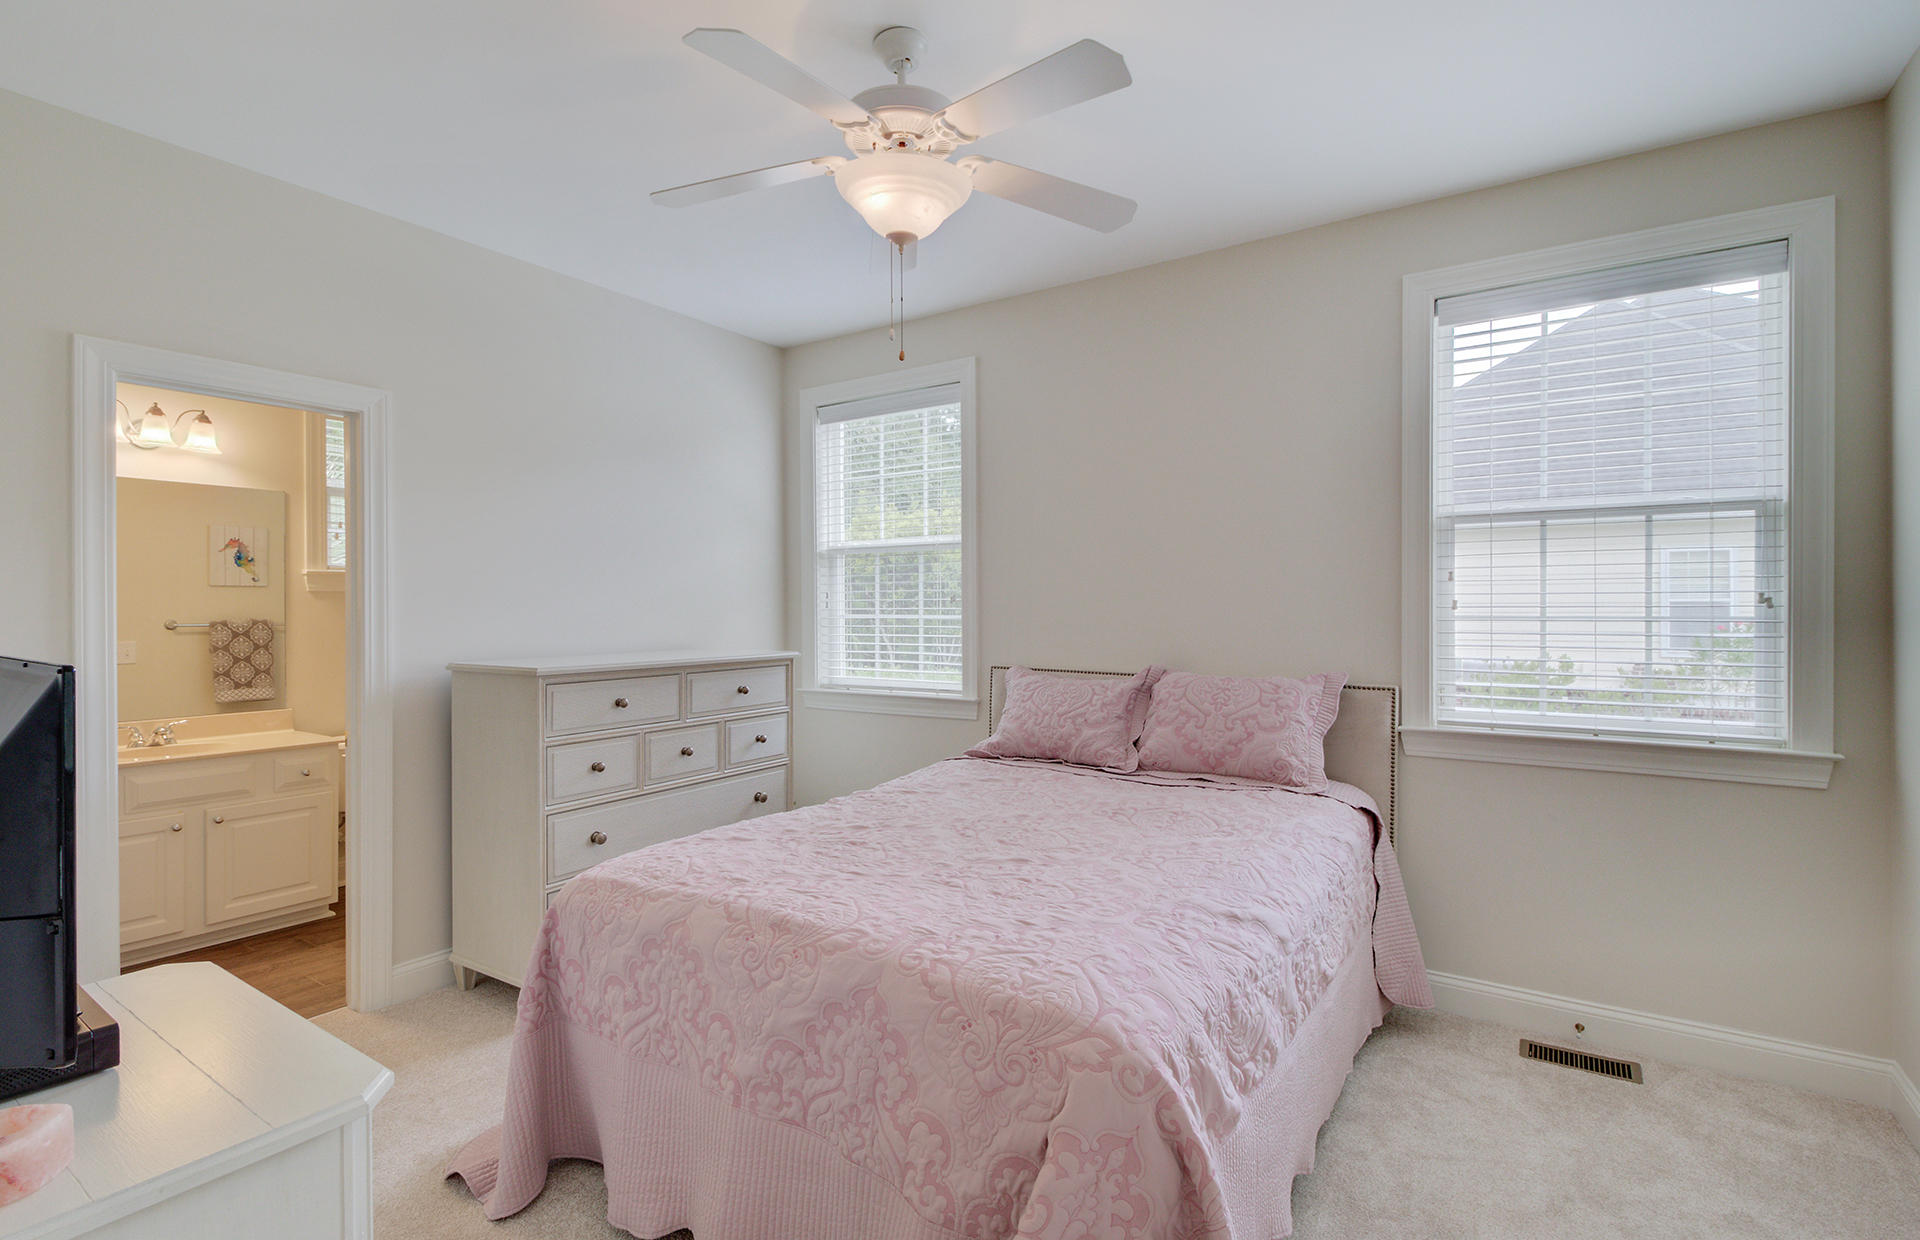 Dunes West Homes For Sale - 2453 Darts Cove, Mount Pleasant, SC - 3